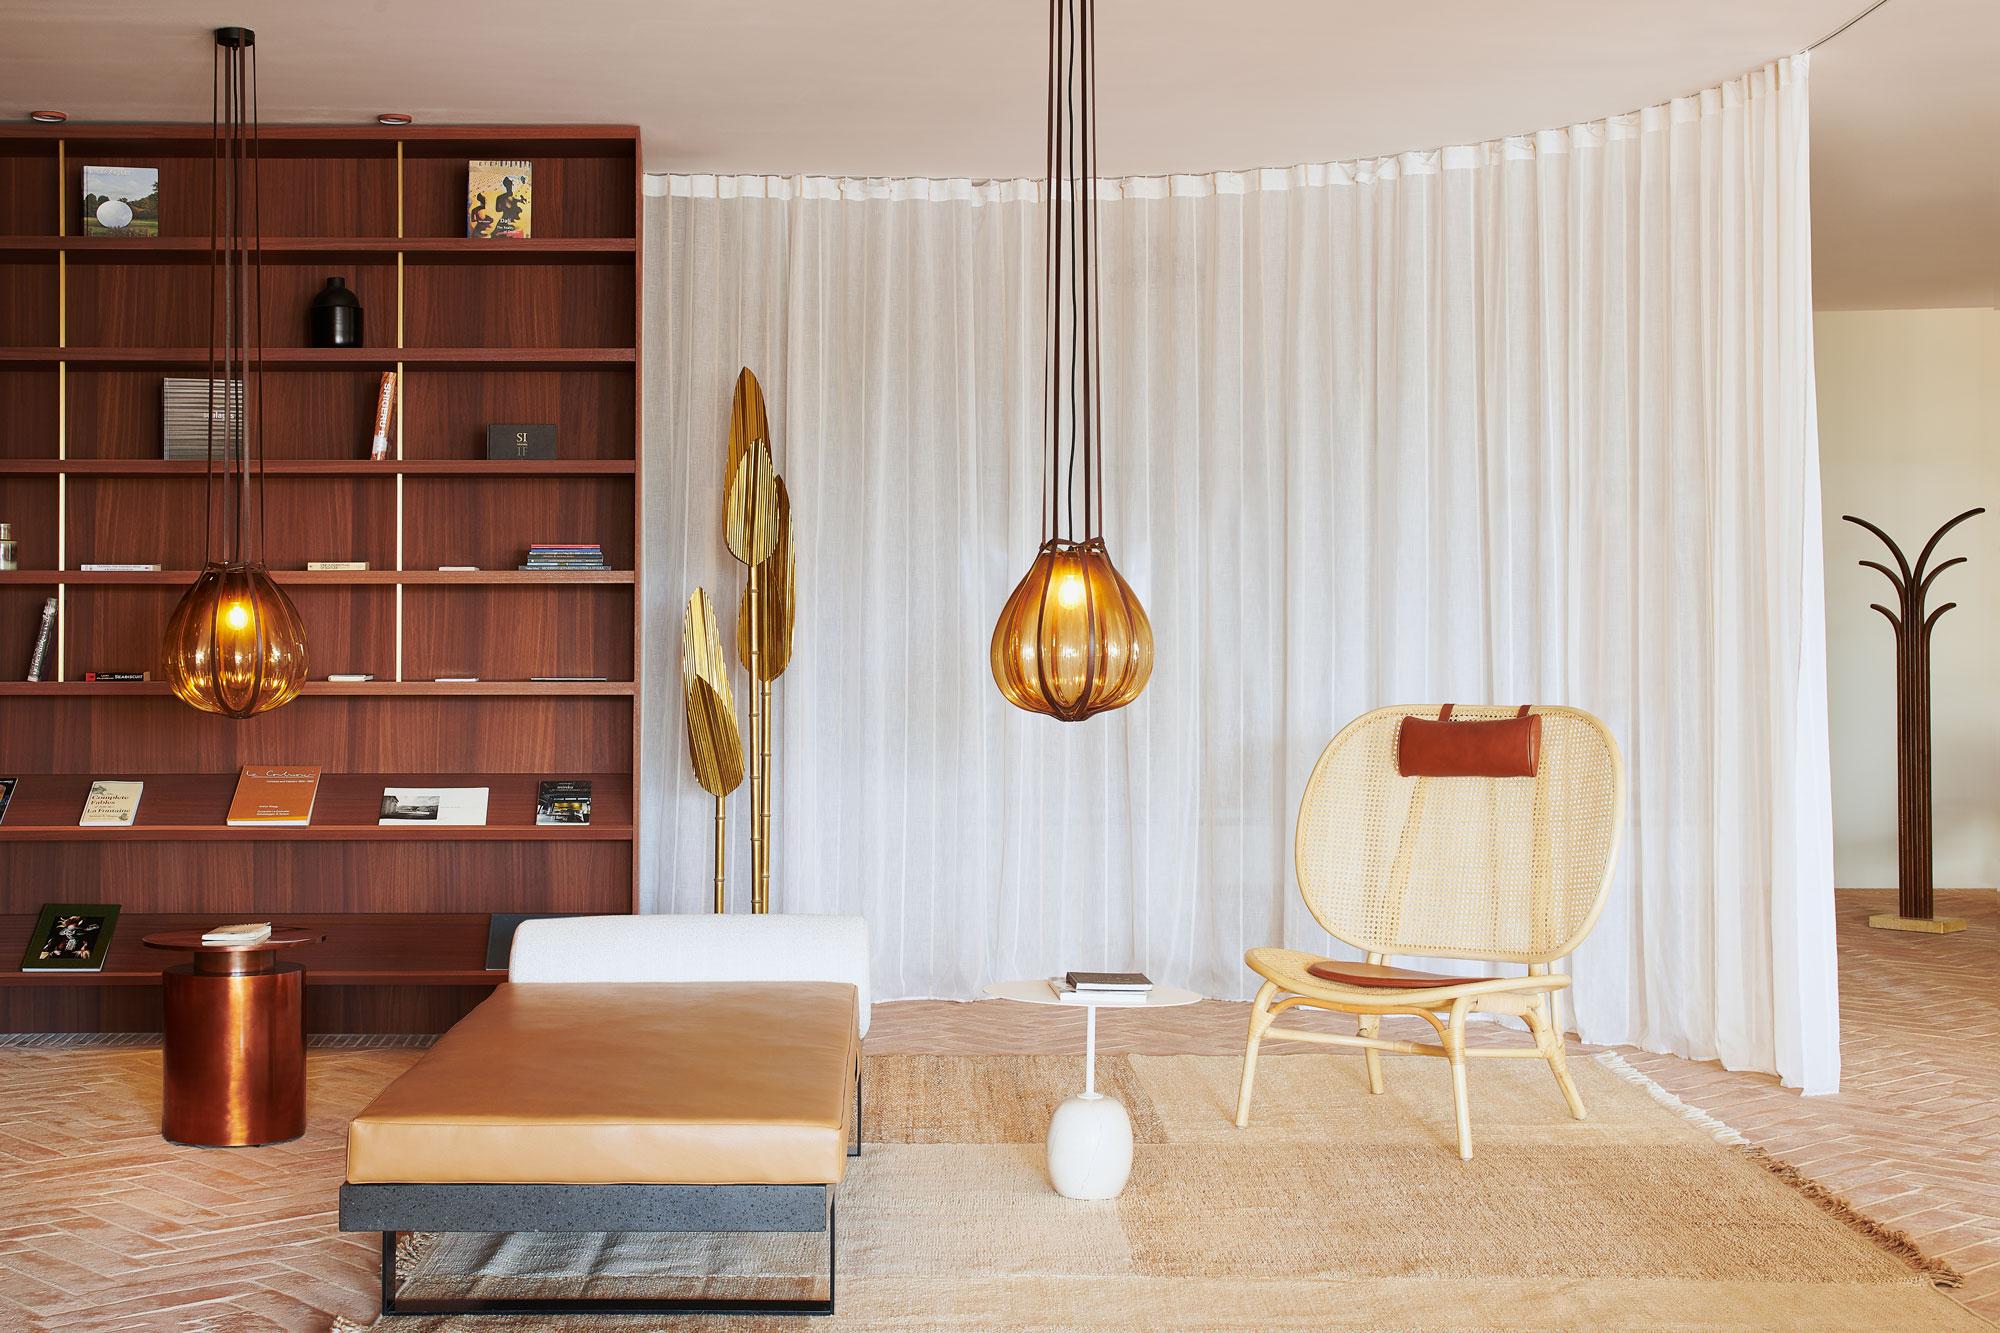 Lam Studio Hotel Maslina Hvar Croatia Luxury Accommodatino Photo Claire Israel Yellowtrace 20